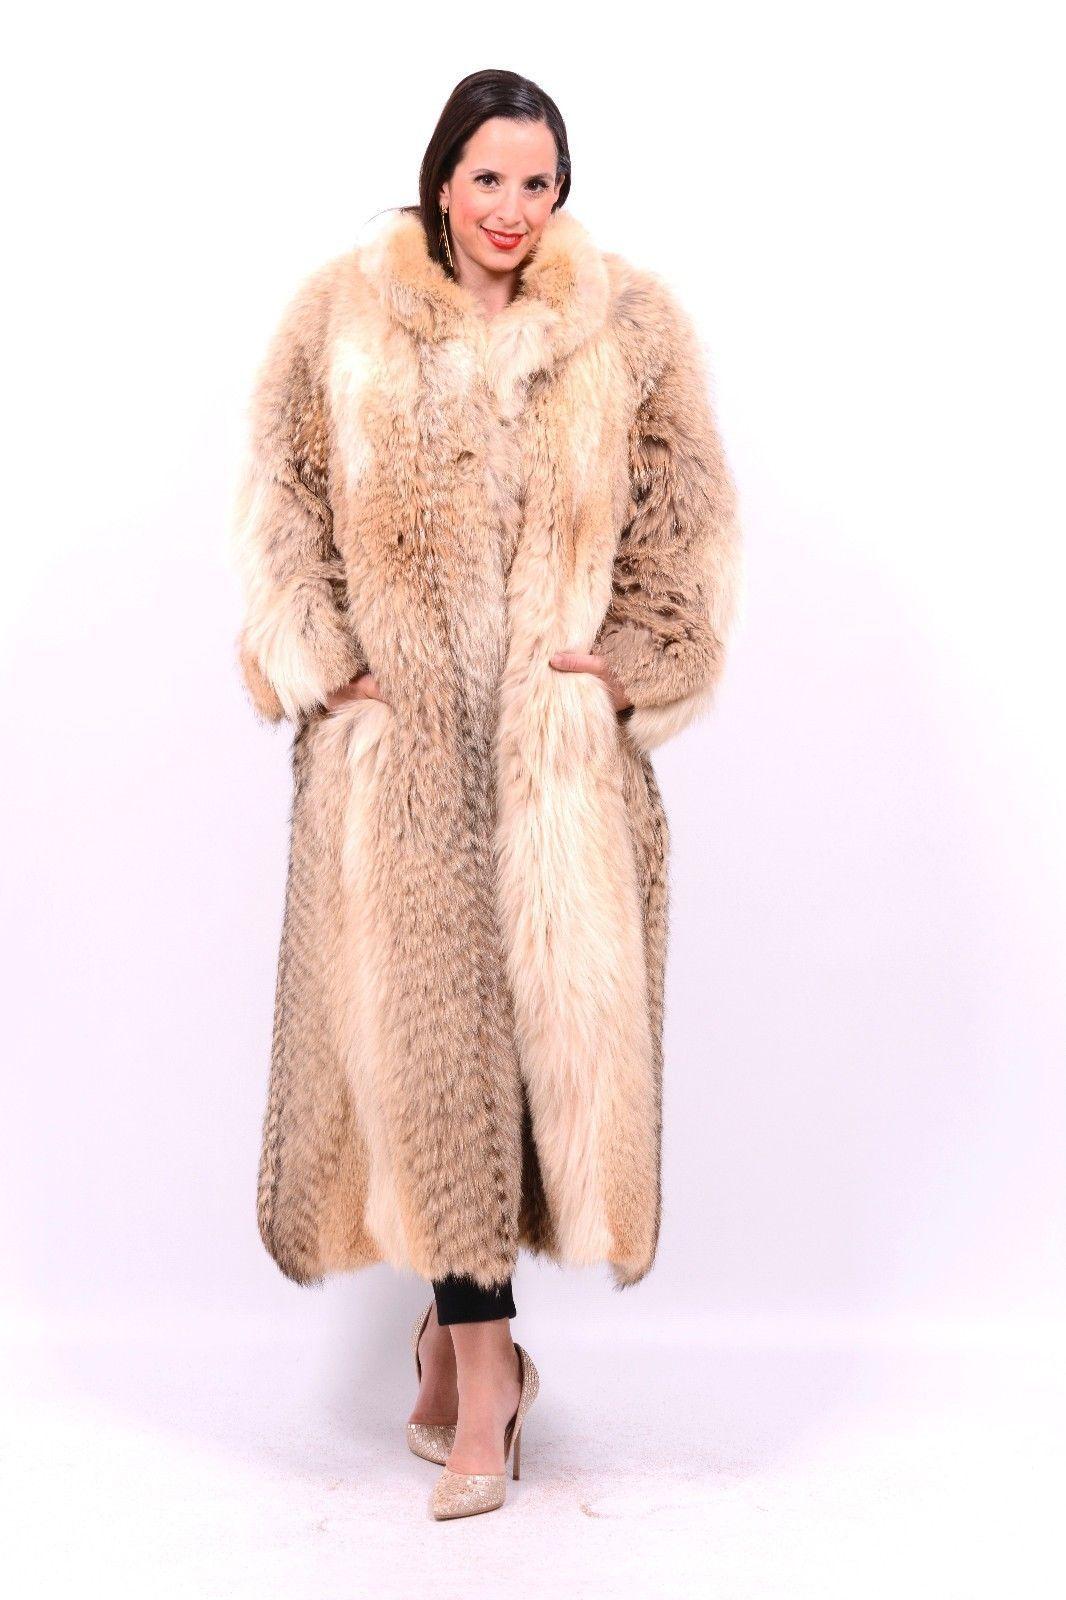 Fox fur coat jacket class of lynx blue white red silver